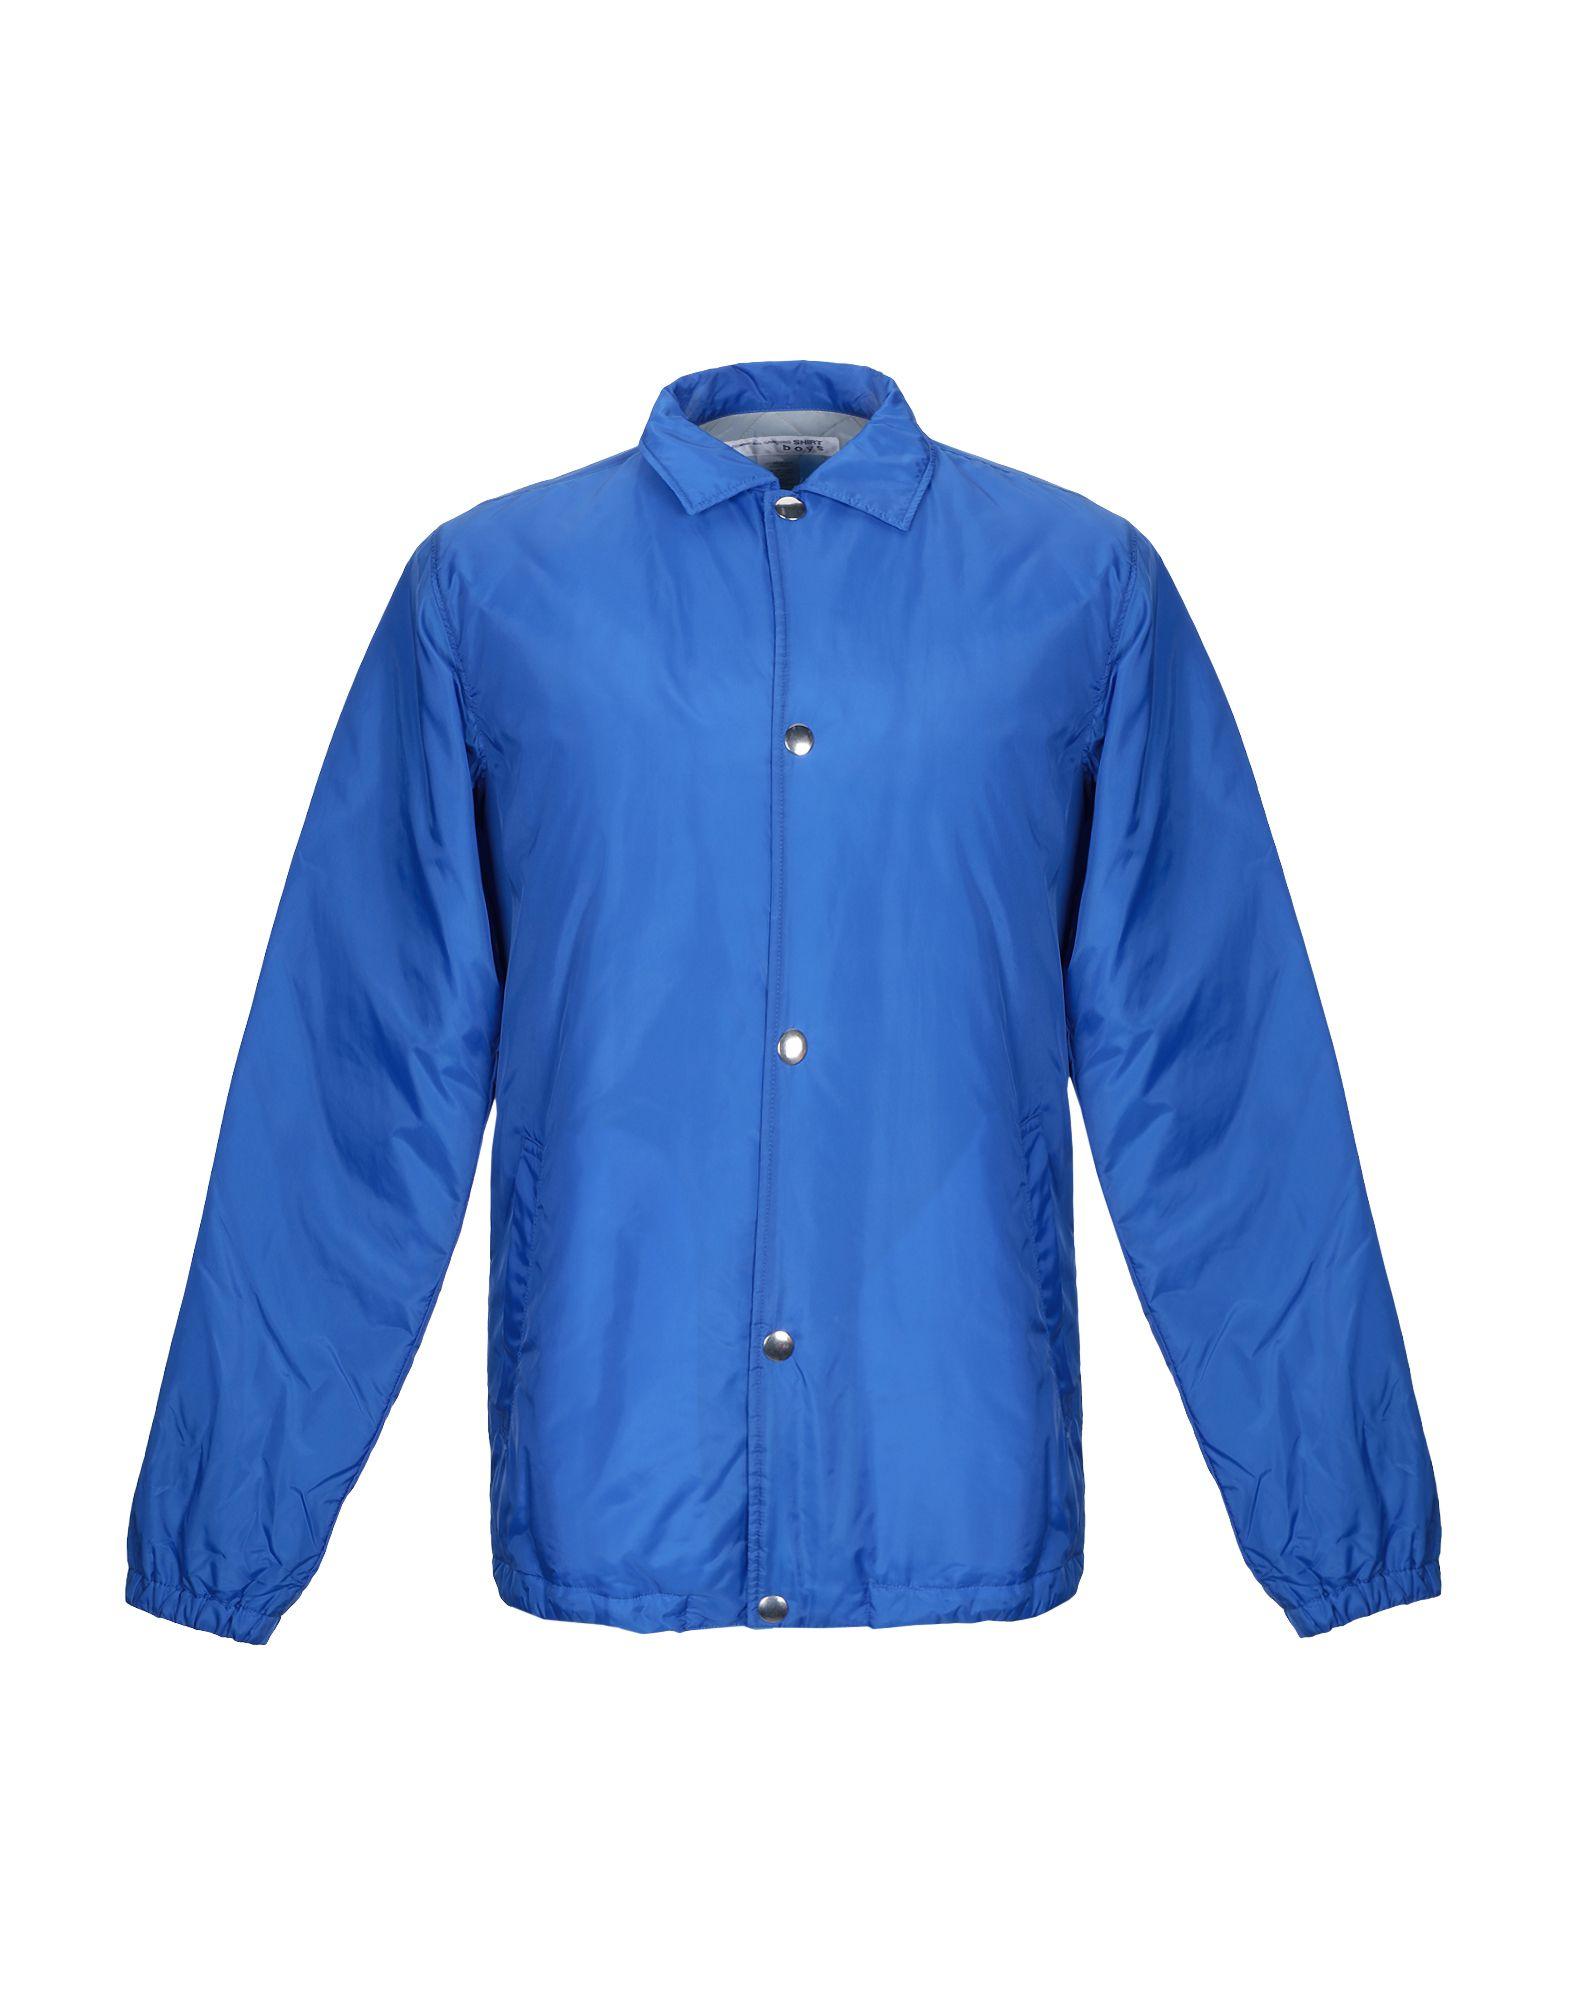 COMME des GARÇONS SHIRT Куртка